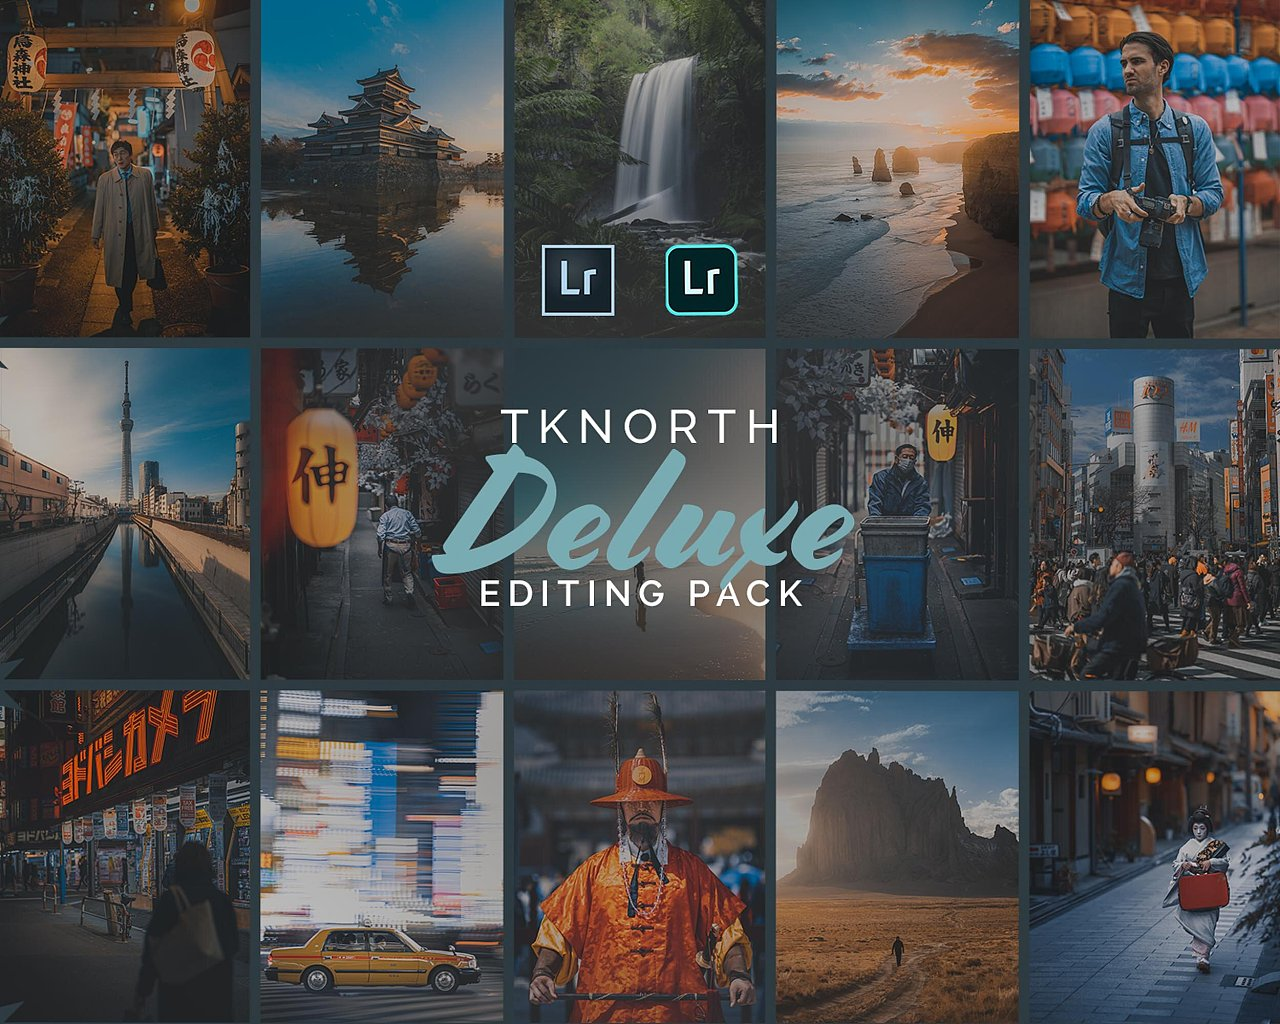 【P289】澳大利亚旅行摄影师蒂姆诺西预设系列 含教程TKNORTH DELUXE EDITING PACK v2 Lightroom Presets